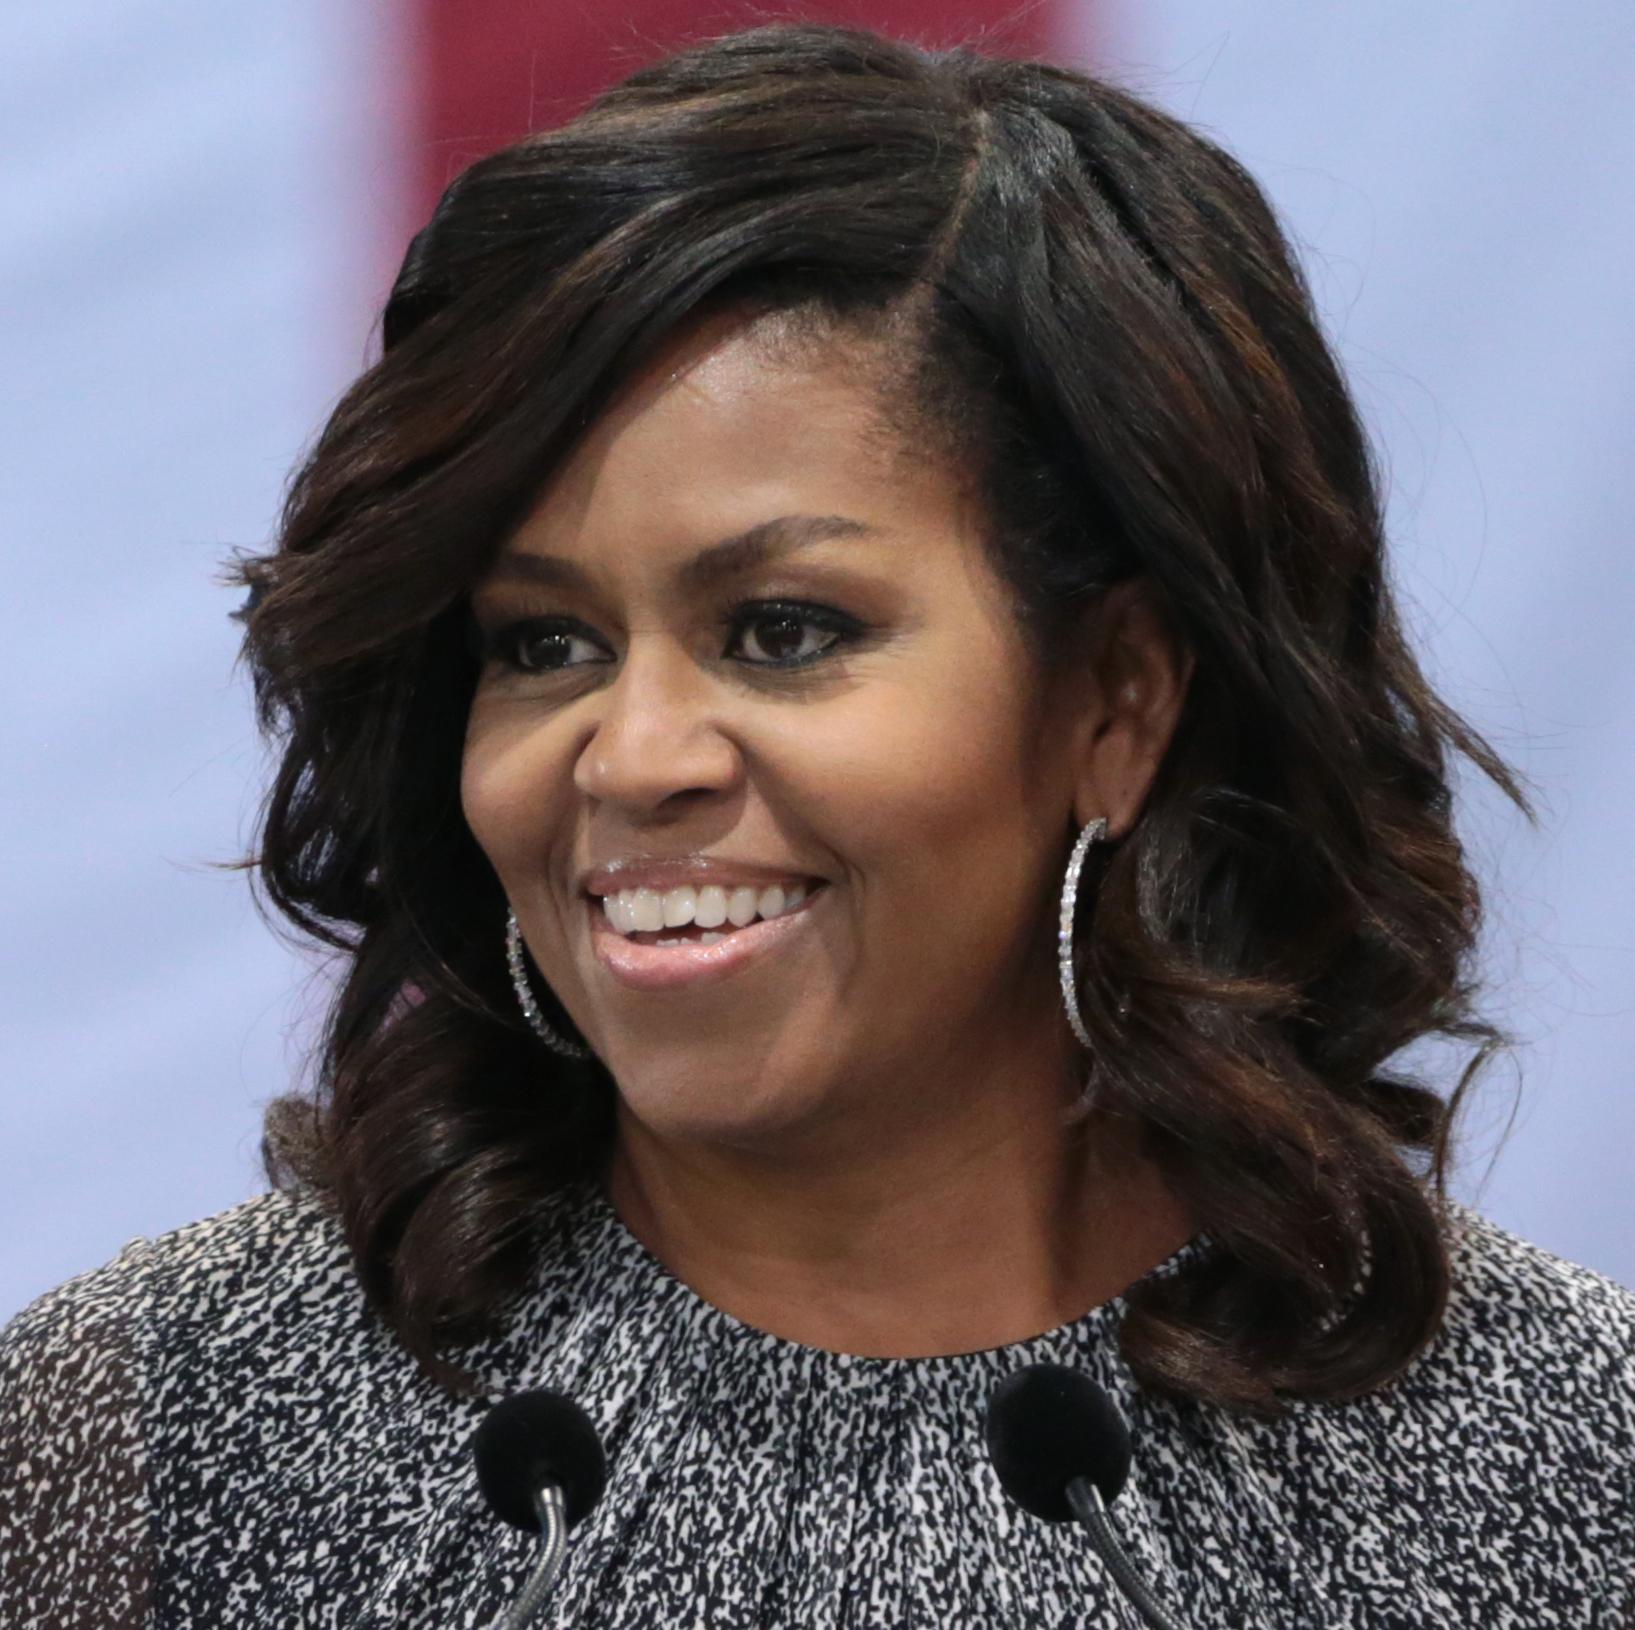 Michelle Obama performance